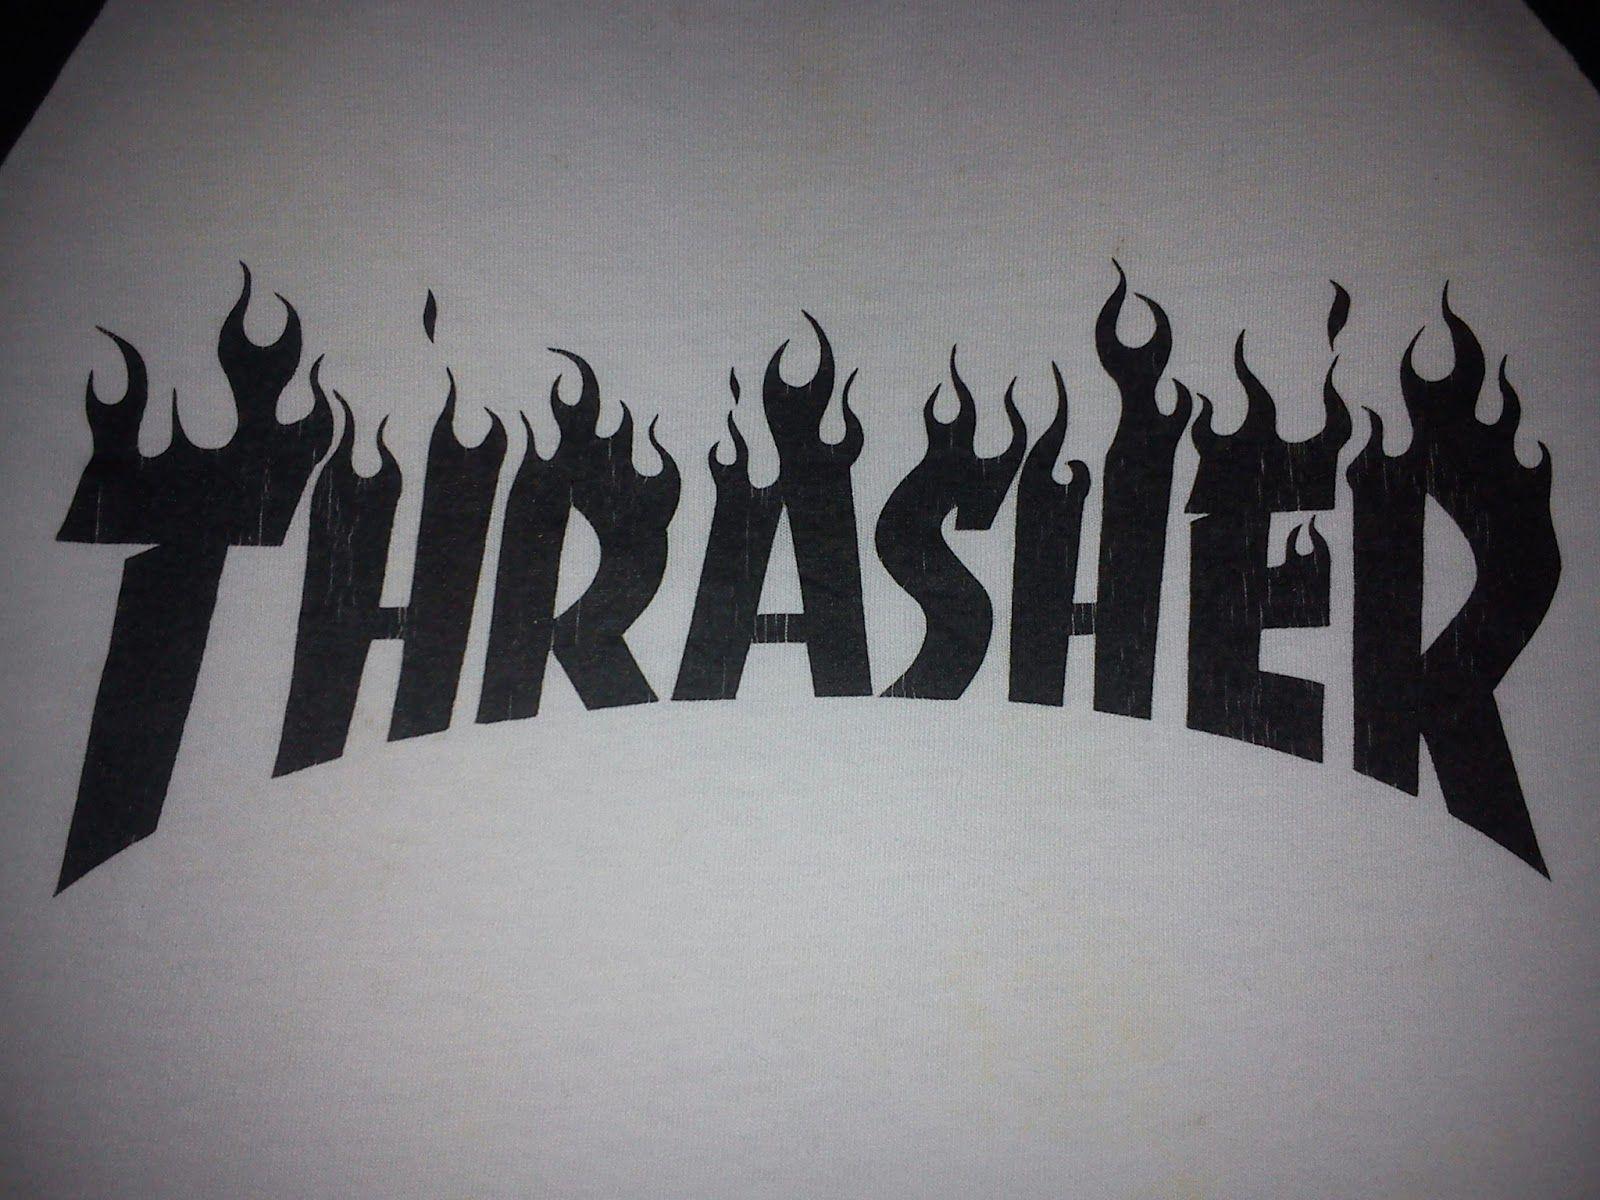 Thrasher Desktop Backgrounds Wallpaper Cave